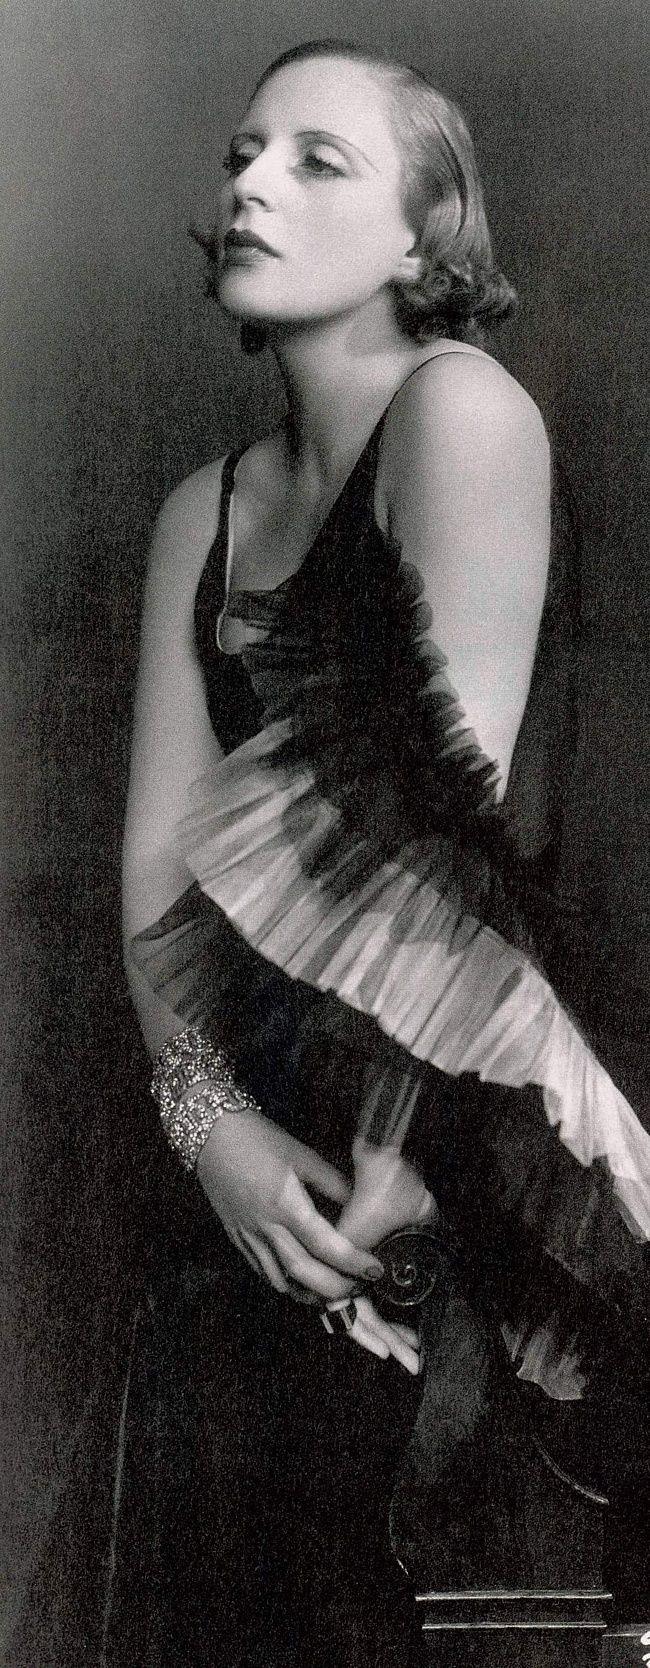 Tamara de Lempicka in Marcel Rochas 1929 Paris Photo by Dora Kallmus (Madame d'Ora Studio) Art Deco Icon